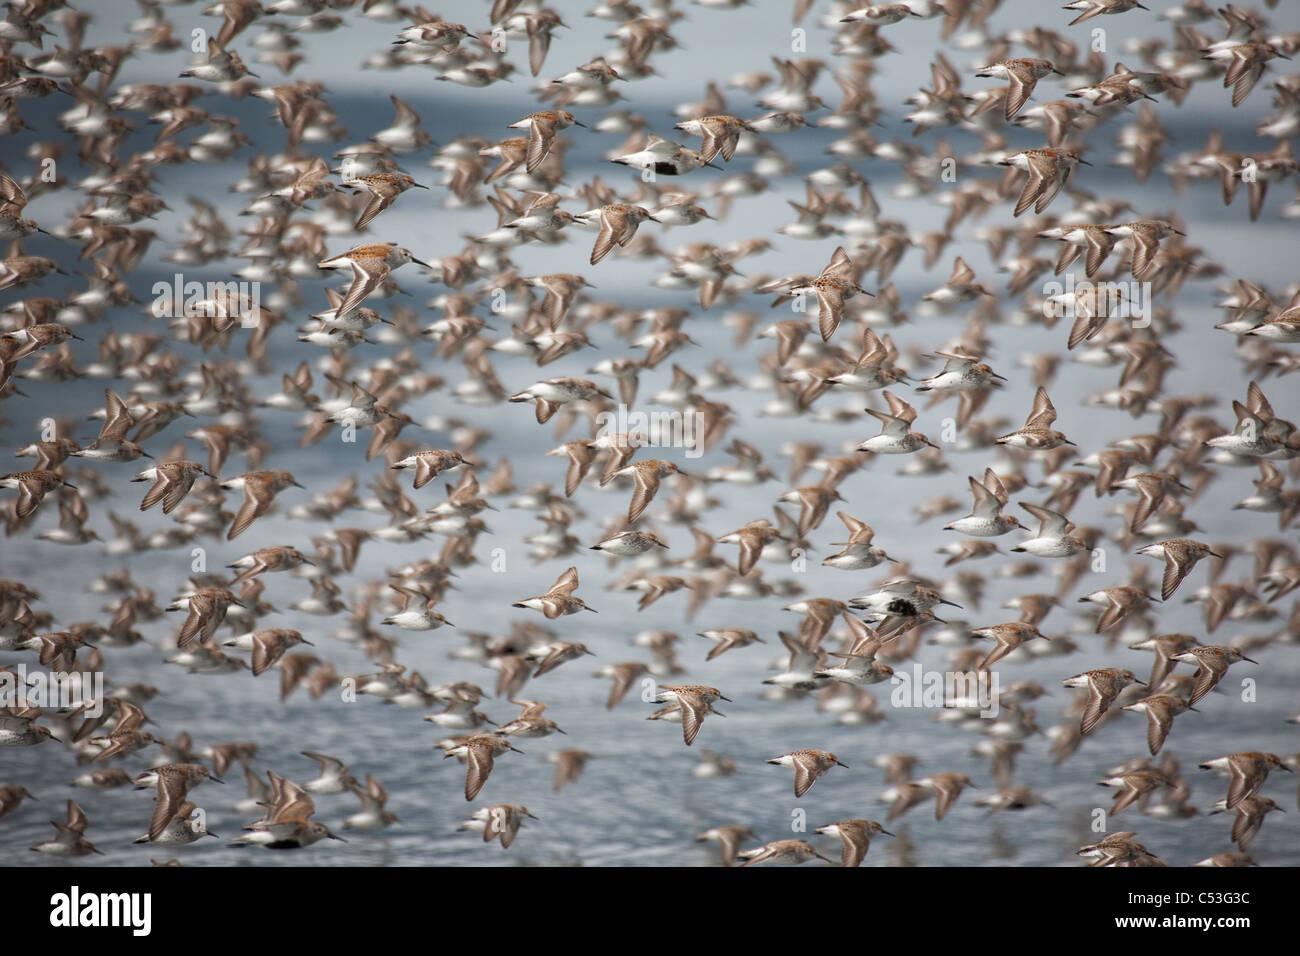 Large flock of shorebirds taking flight on mud flats of Hartney Bay during Spring migration, Copper River Delta, - Stock Image